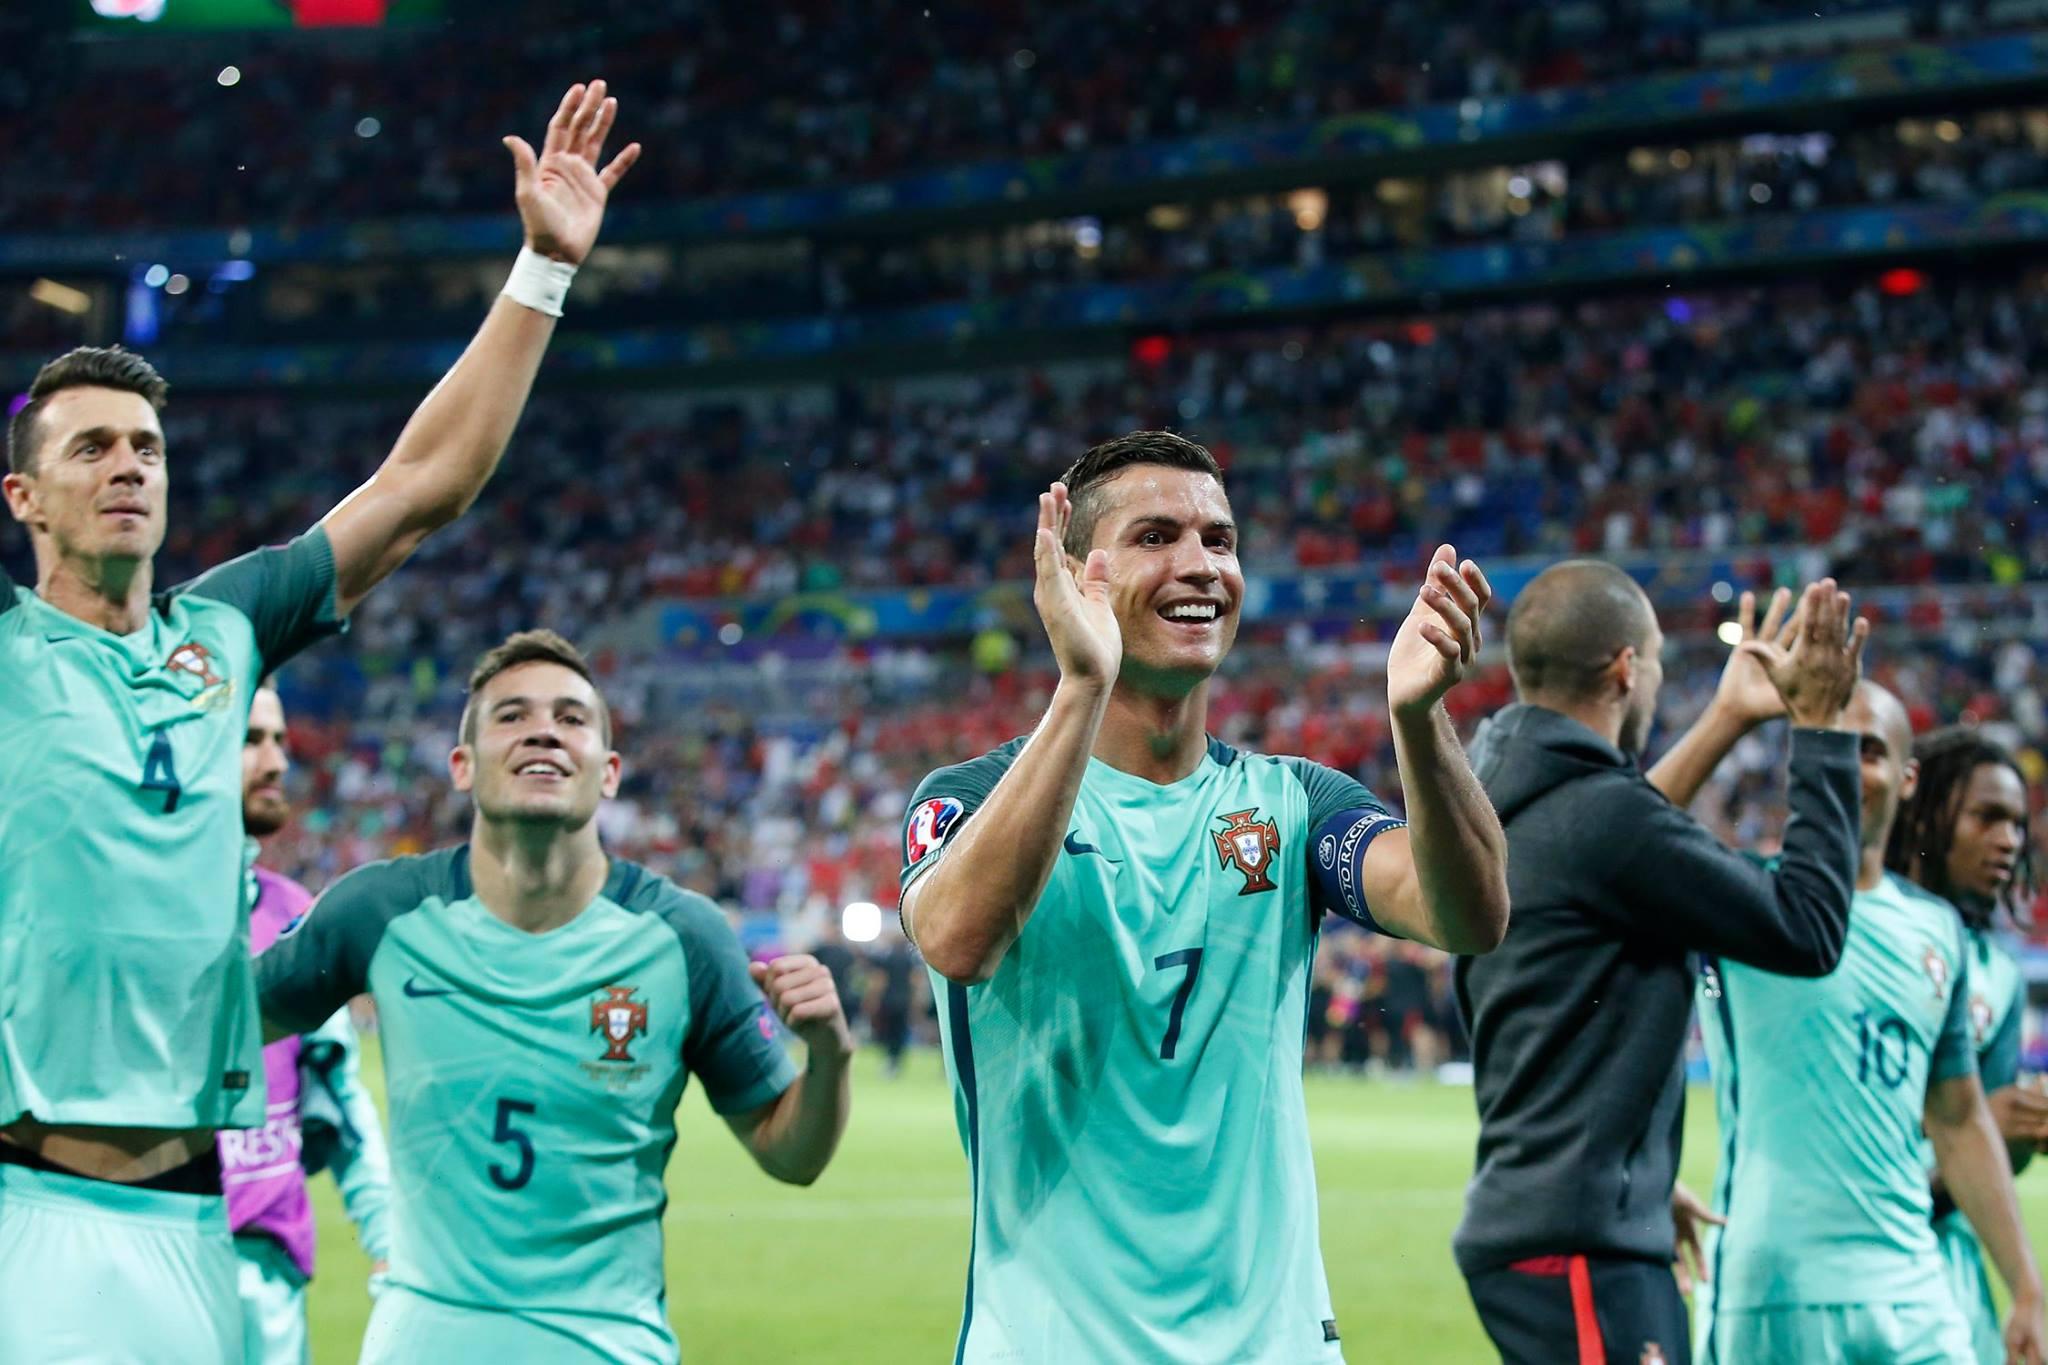 Ronaldo dan Messi bergantian menjadi Pemain Terbaik Dunia selama beberapa tahun terakhir. Foto dari Facebook/selecoesportugal